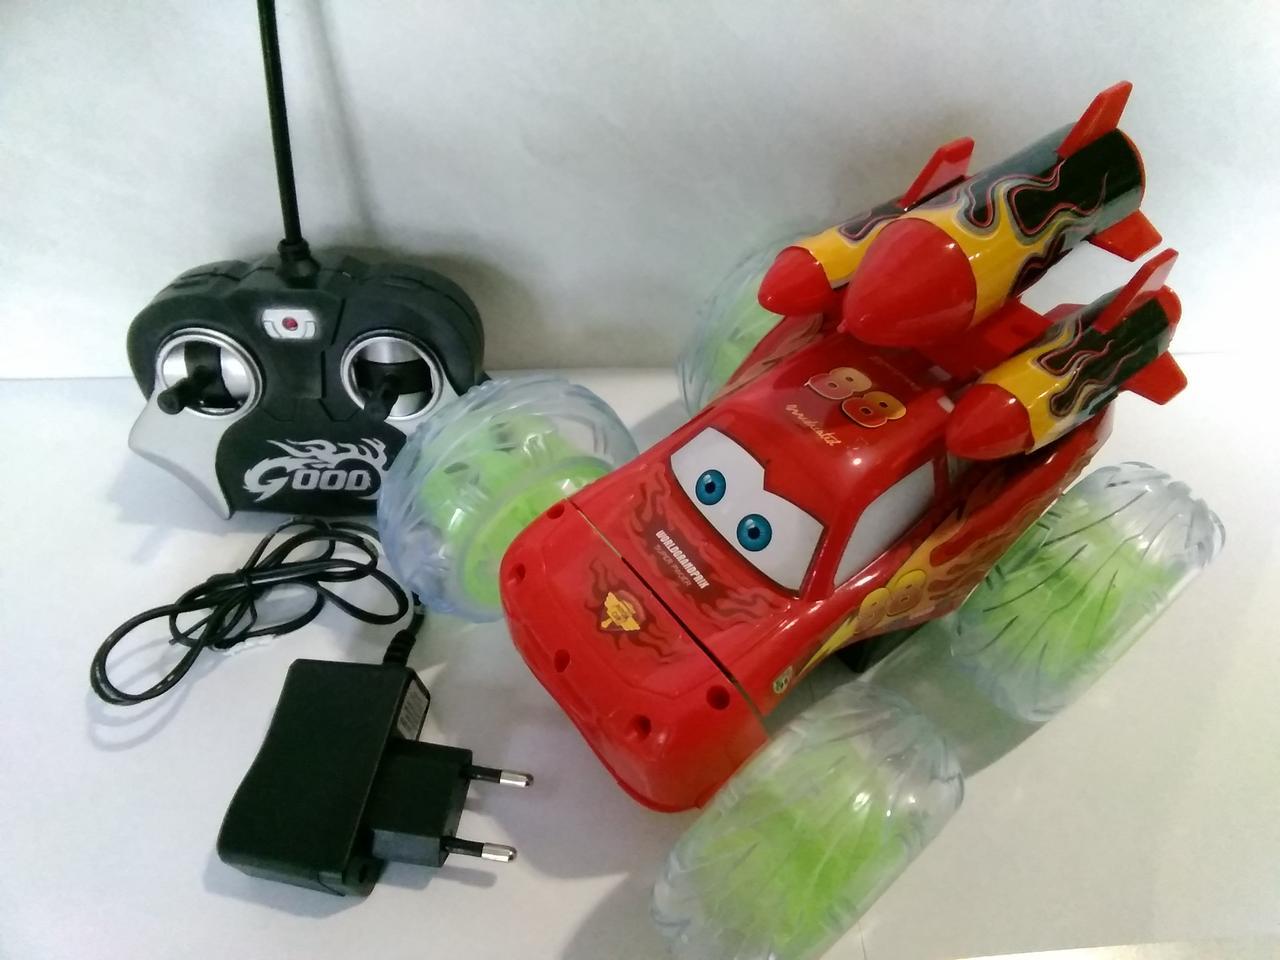 Машина детская Тачки на радиоуправлении.Игрушка машина на батарейках.